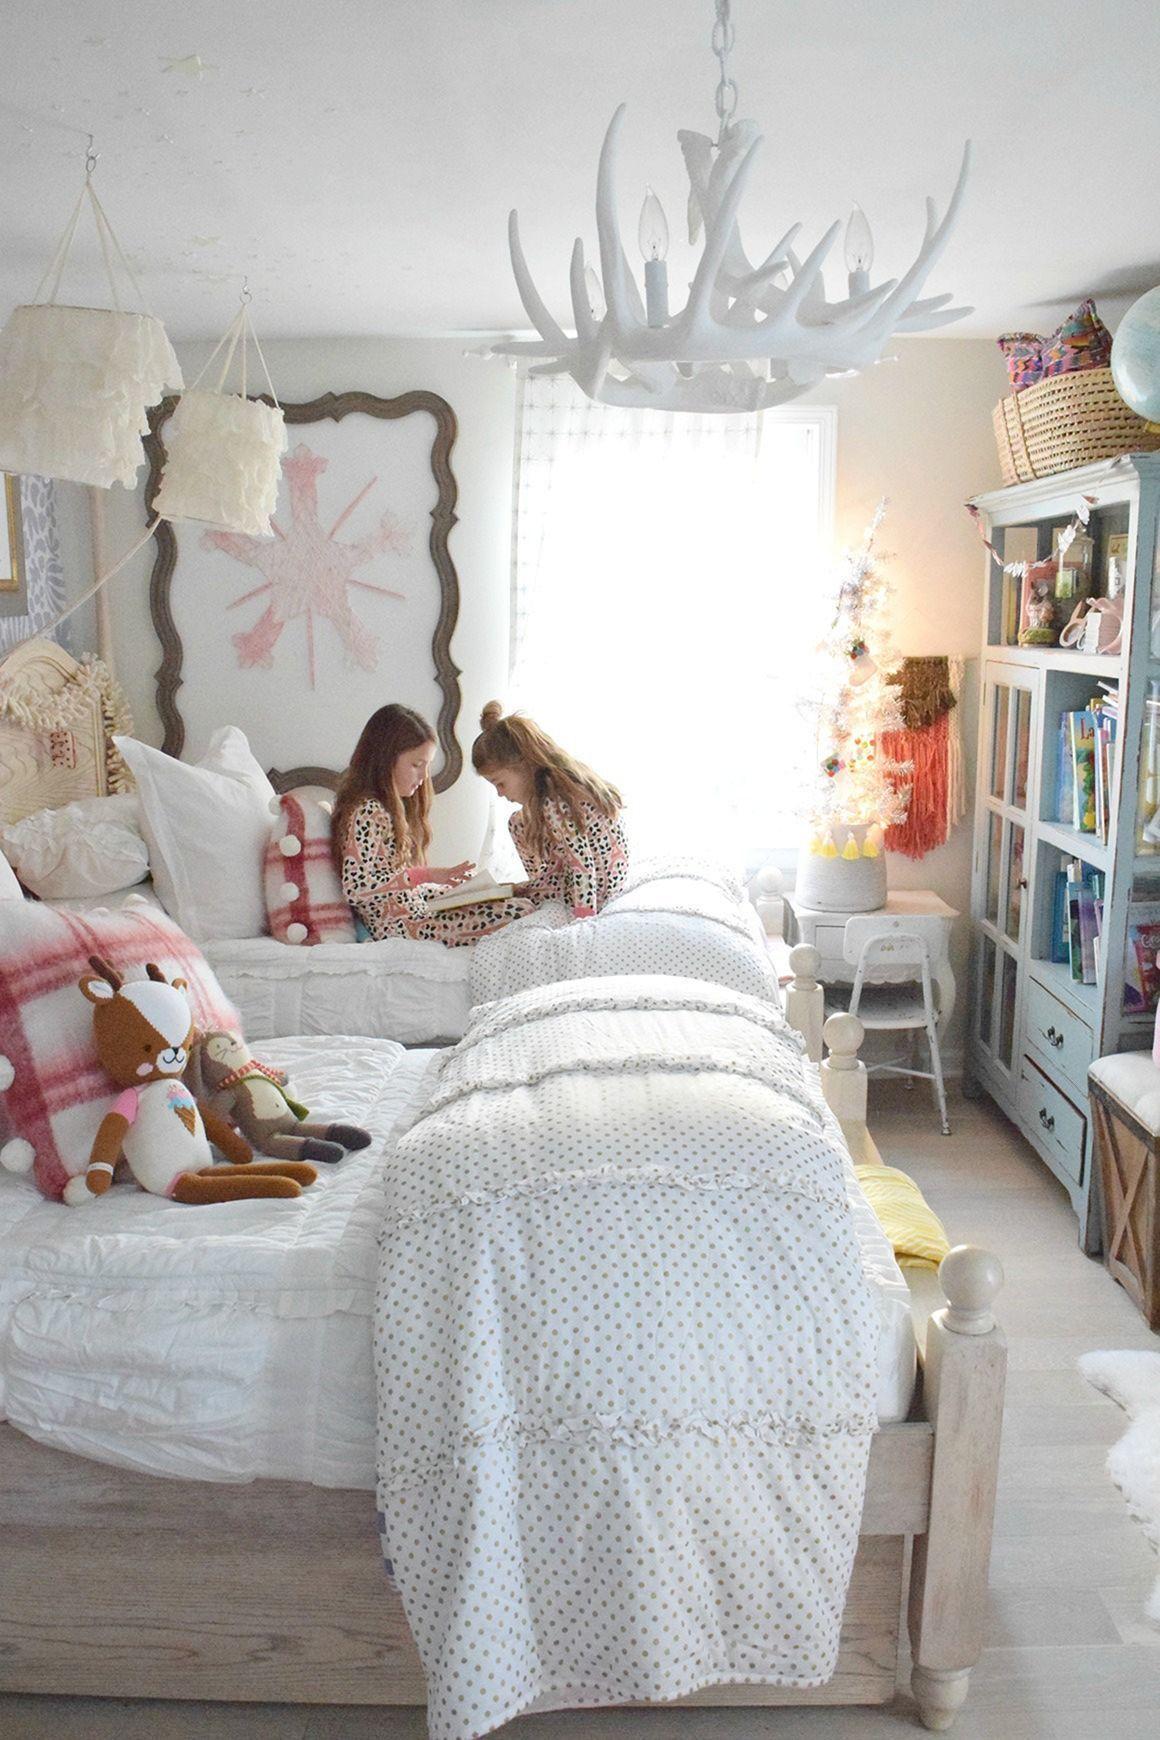 Marvelous 45+ Adorable Interior Themed Christmas Bedroom Decorating Ideas Httpsfreshouz